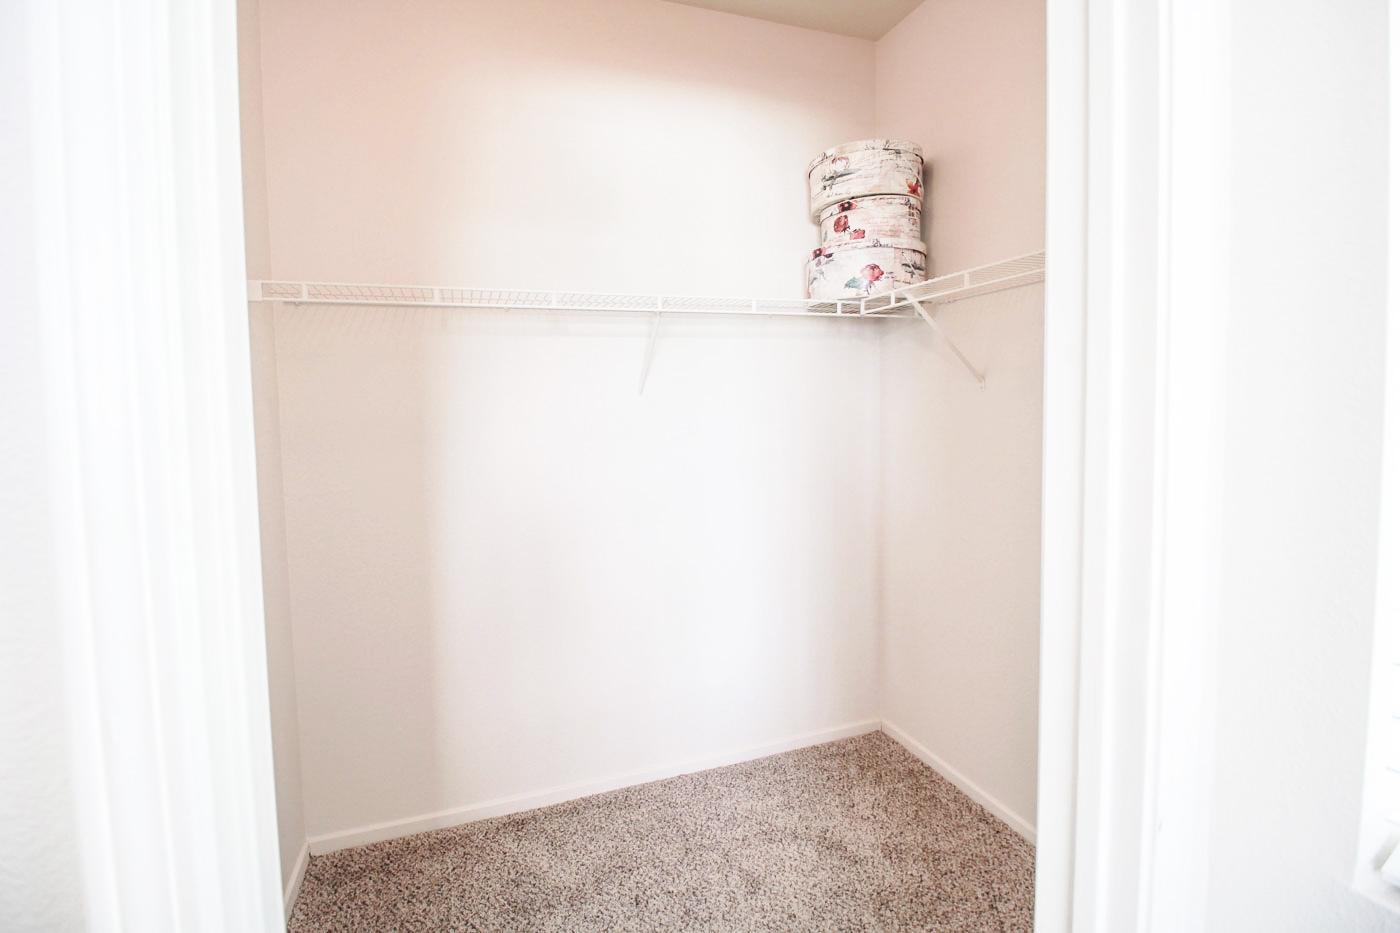 Large empty closet.